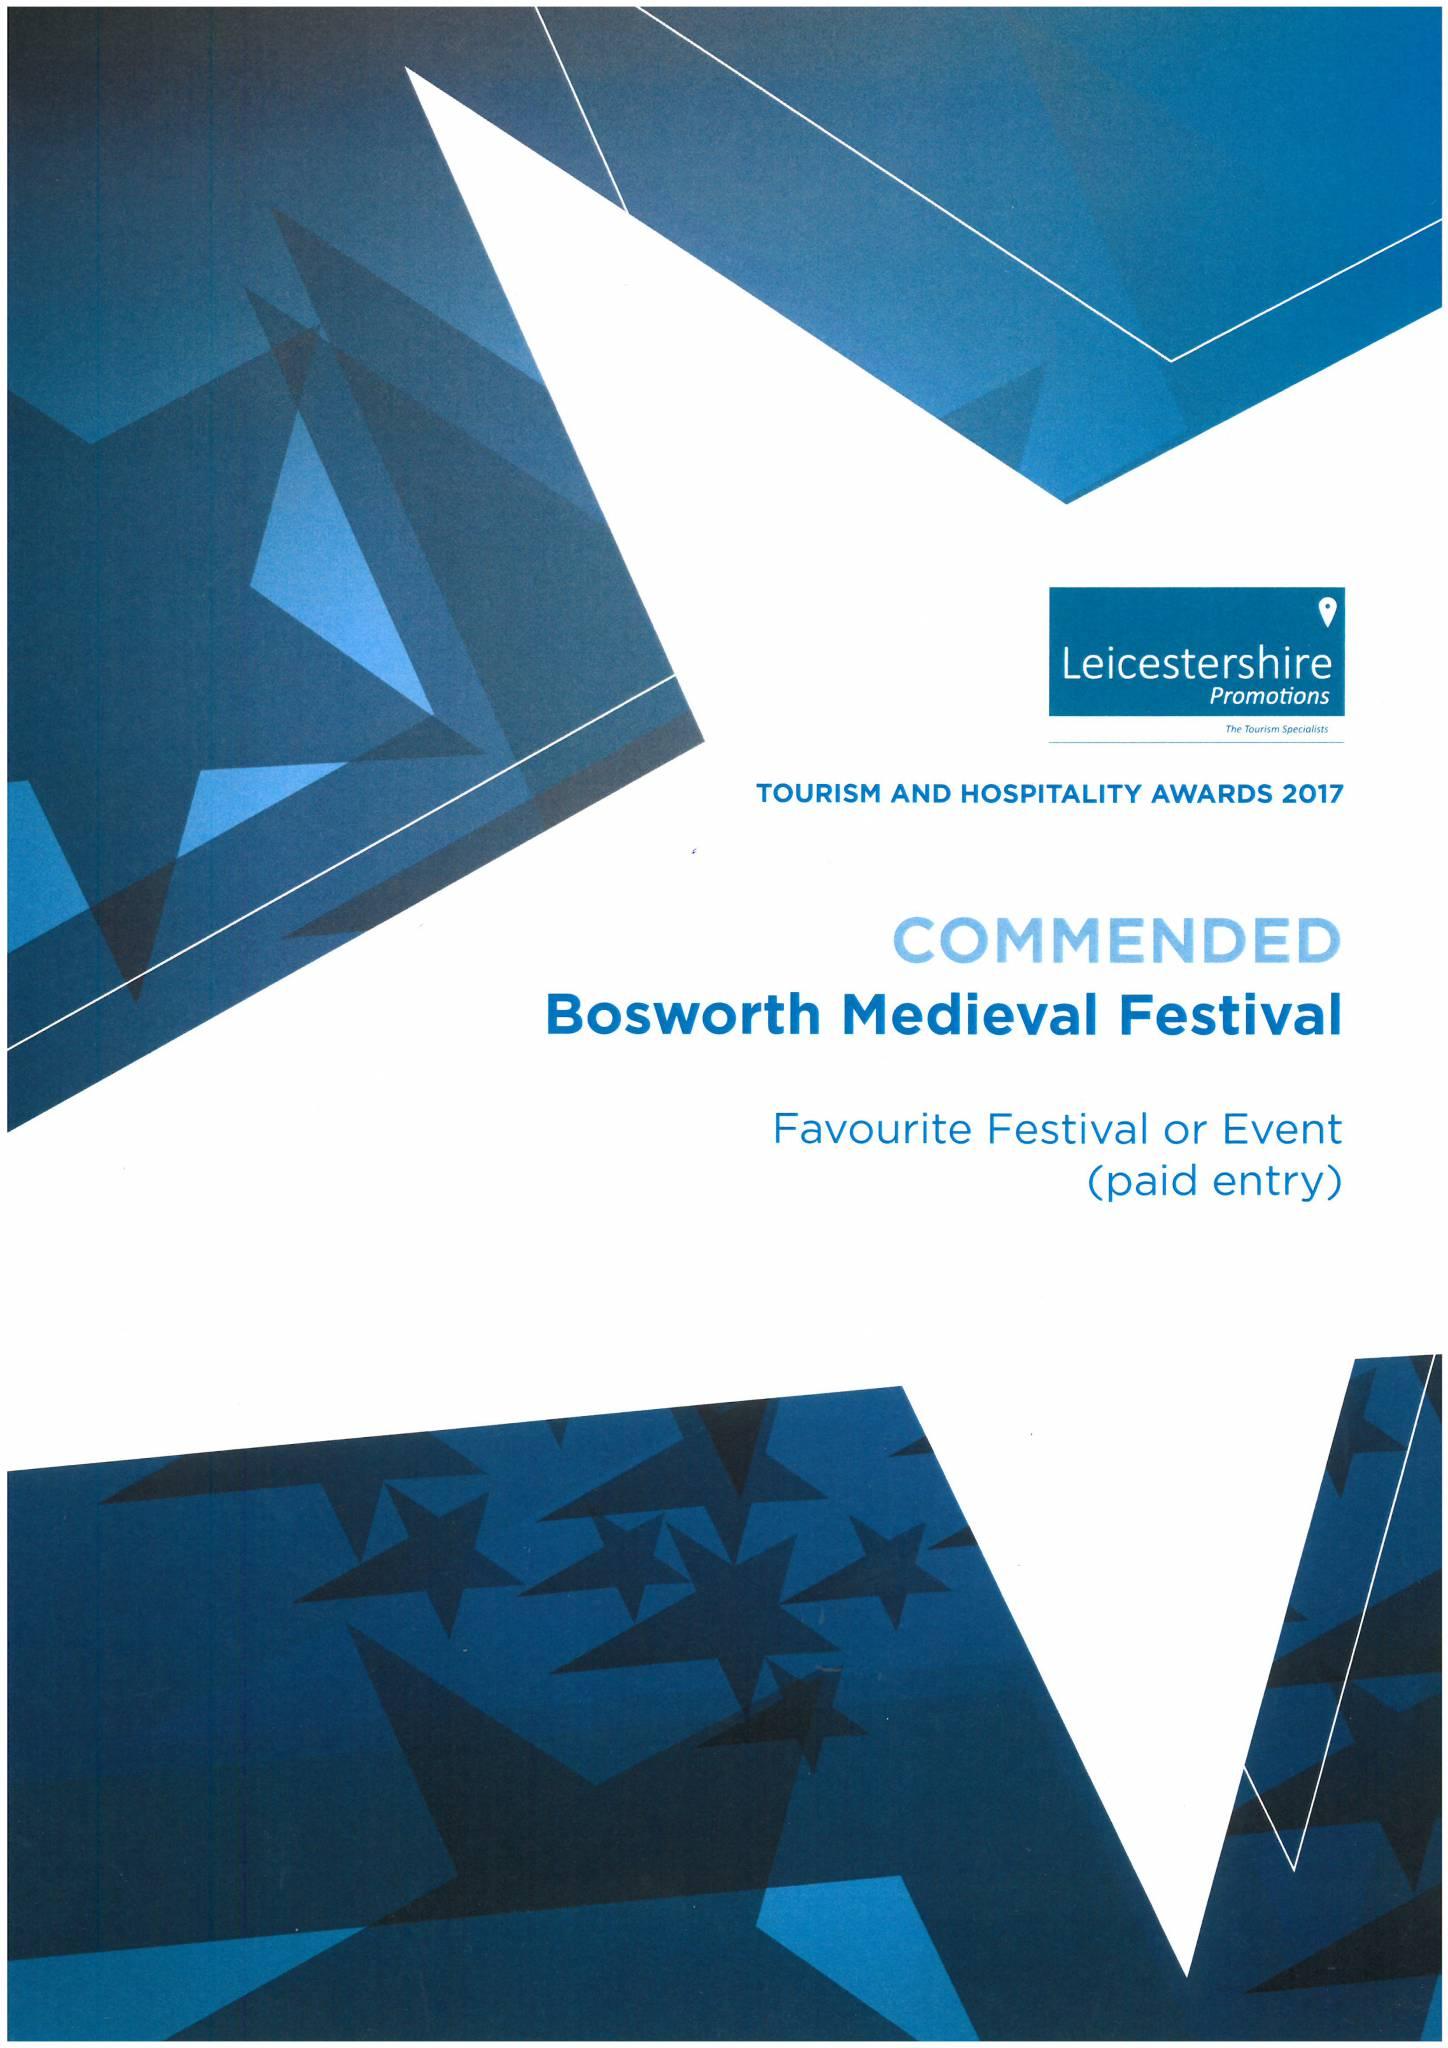 Bosworth Medieval Festival: 2019